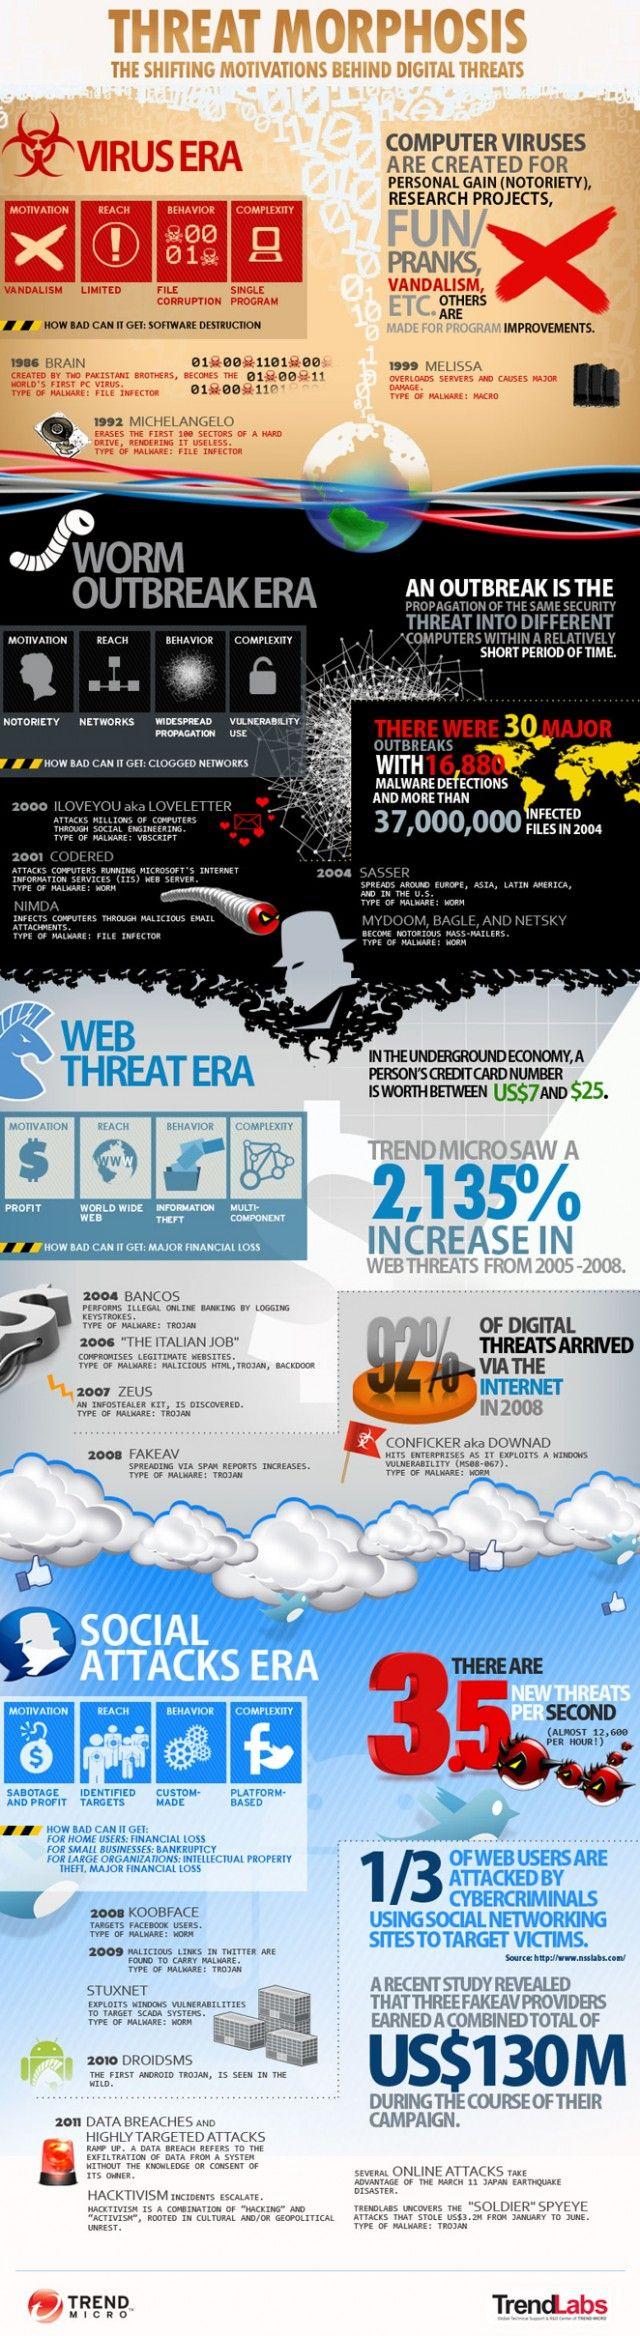 Evolution of cyber attacks